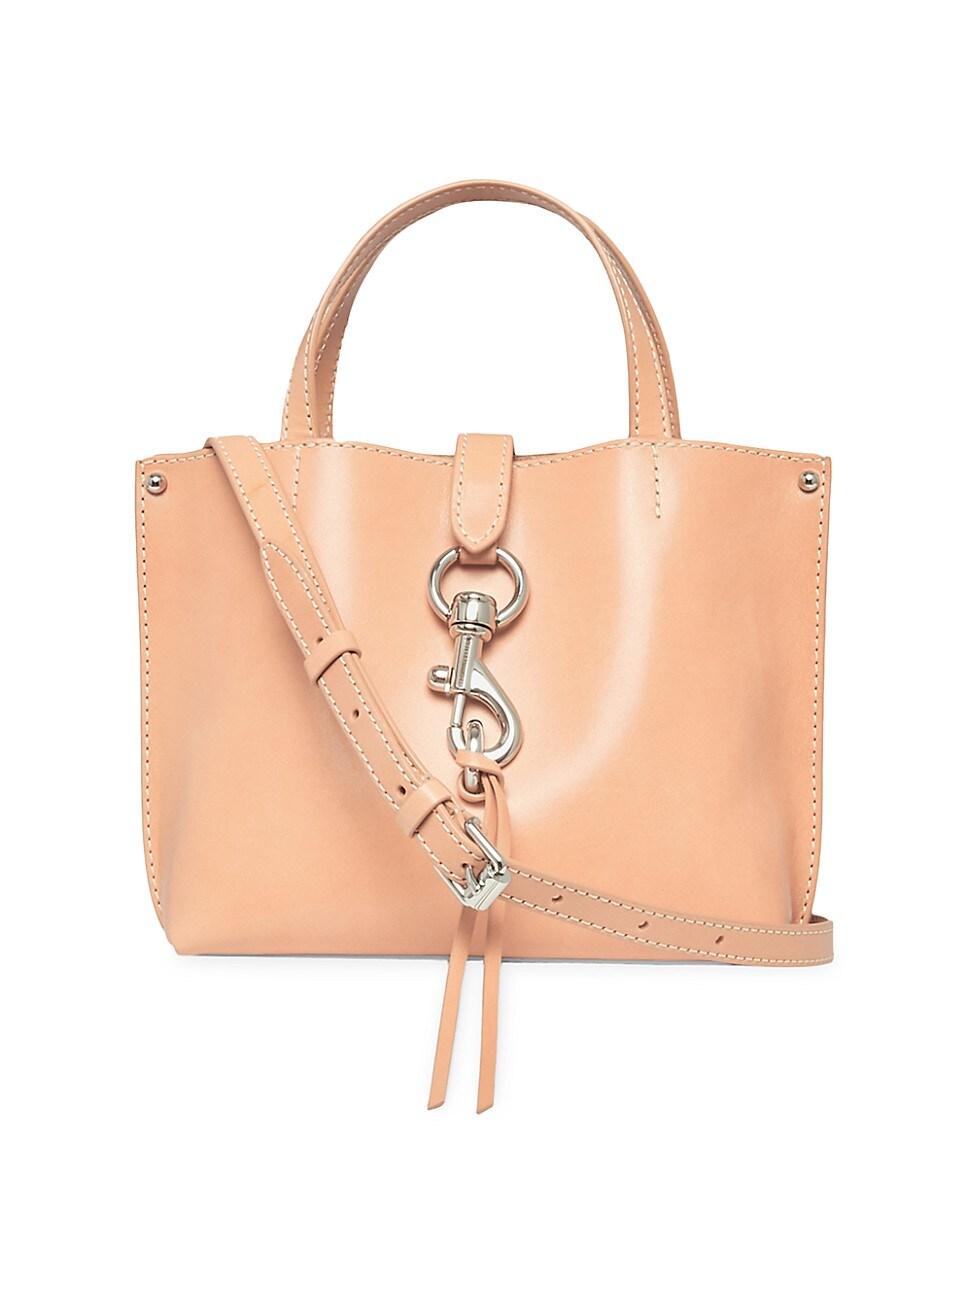 Rebecca Minkoff Women's Mini Megan Leather Tote Crossbody Bag In Peach